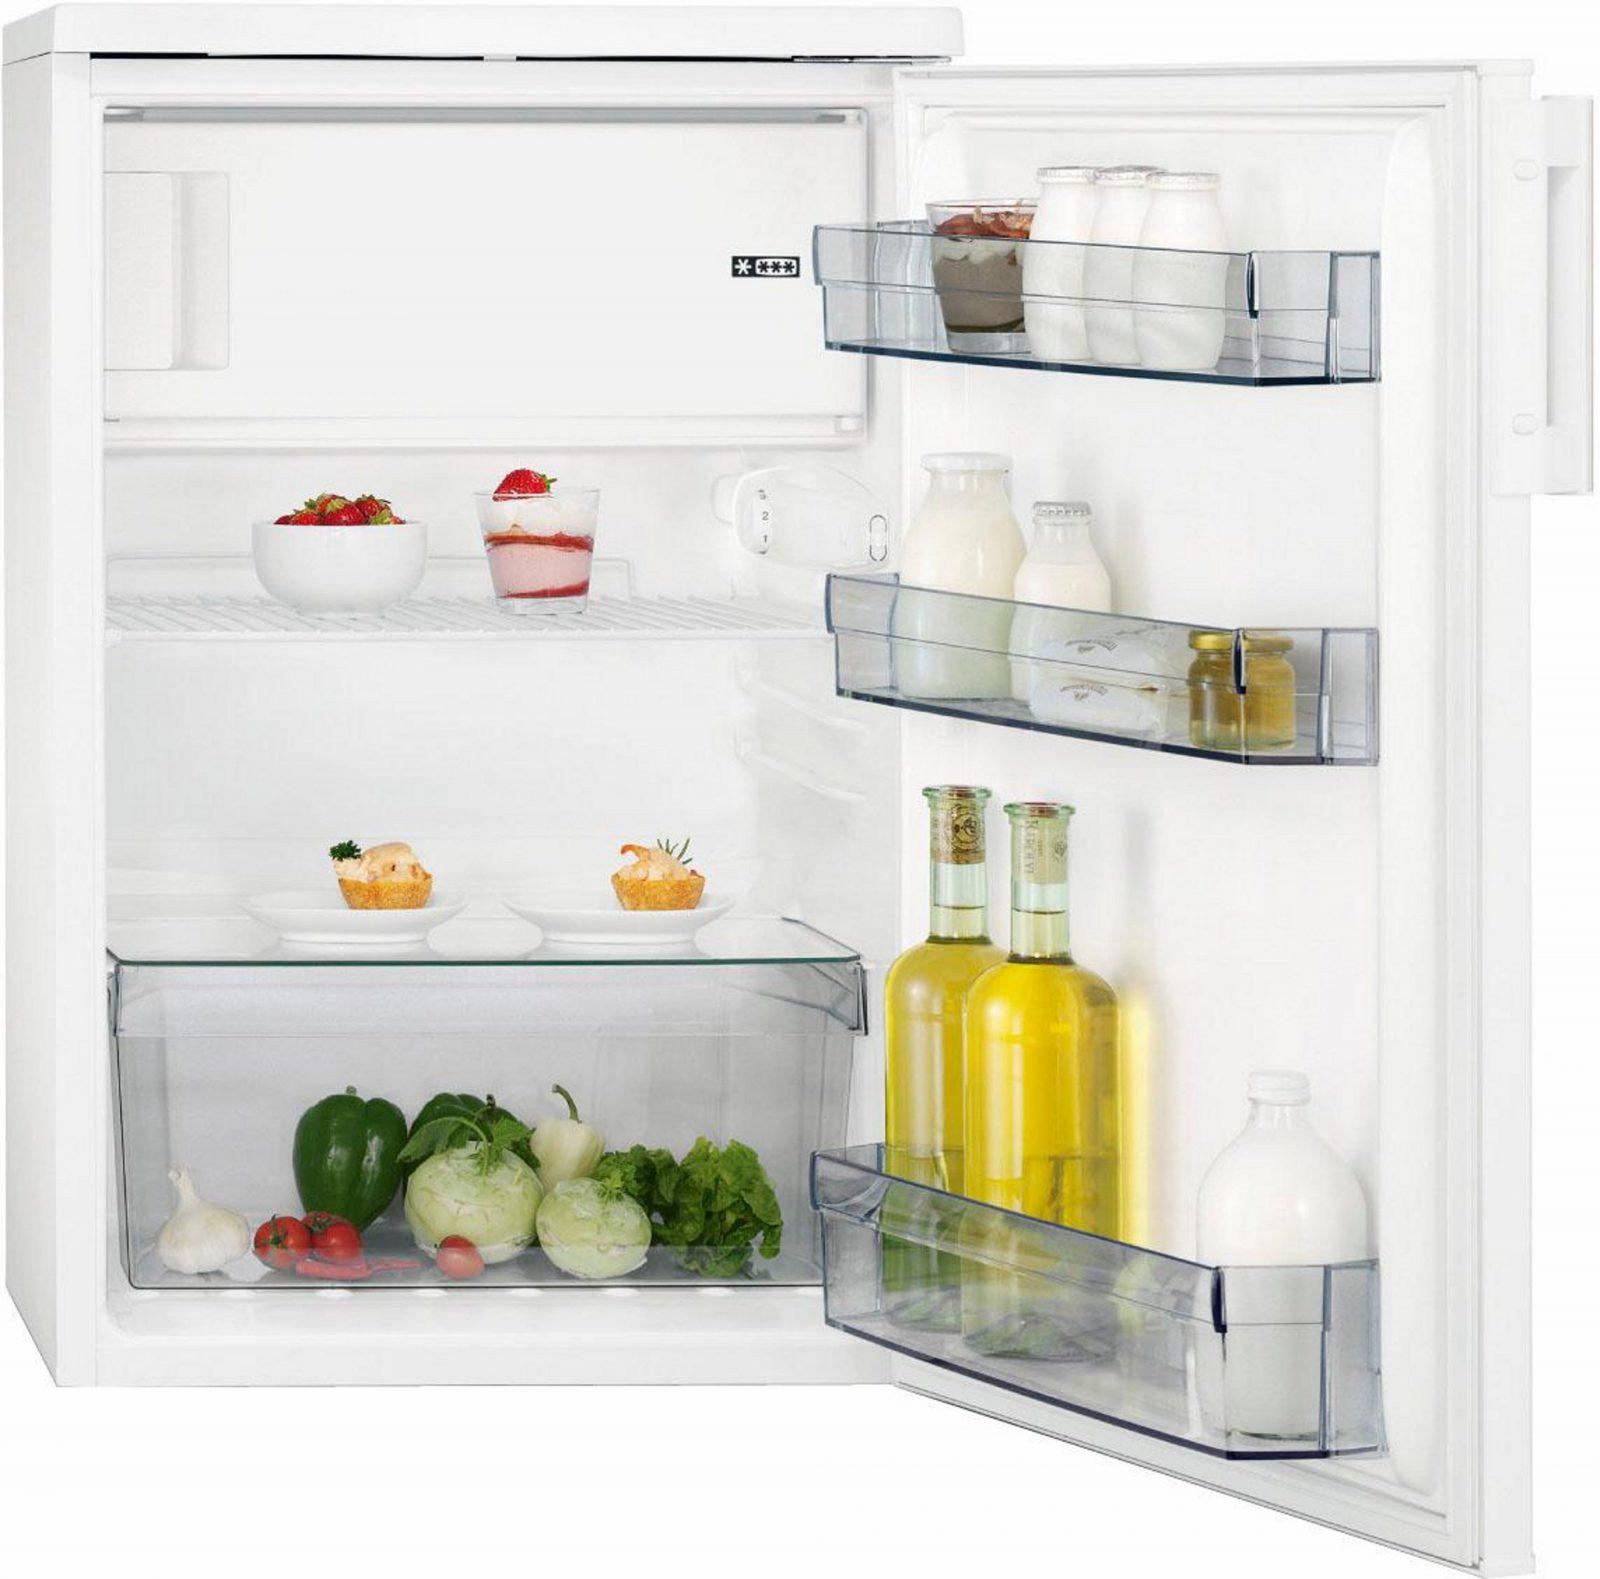 Kühlschrank 55 Cm Breit Bosch Kil72Af30 A Integrierbarer K von Kühlschrank 55 Cm Breit Bild